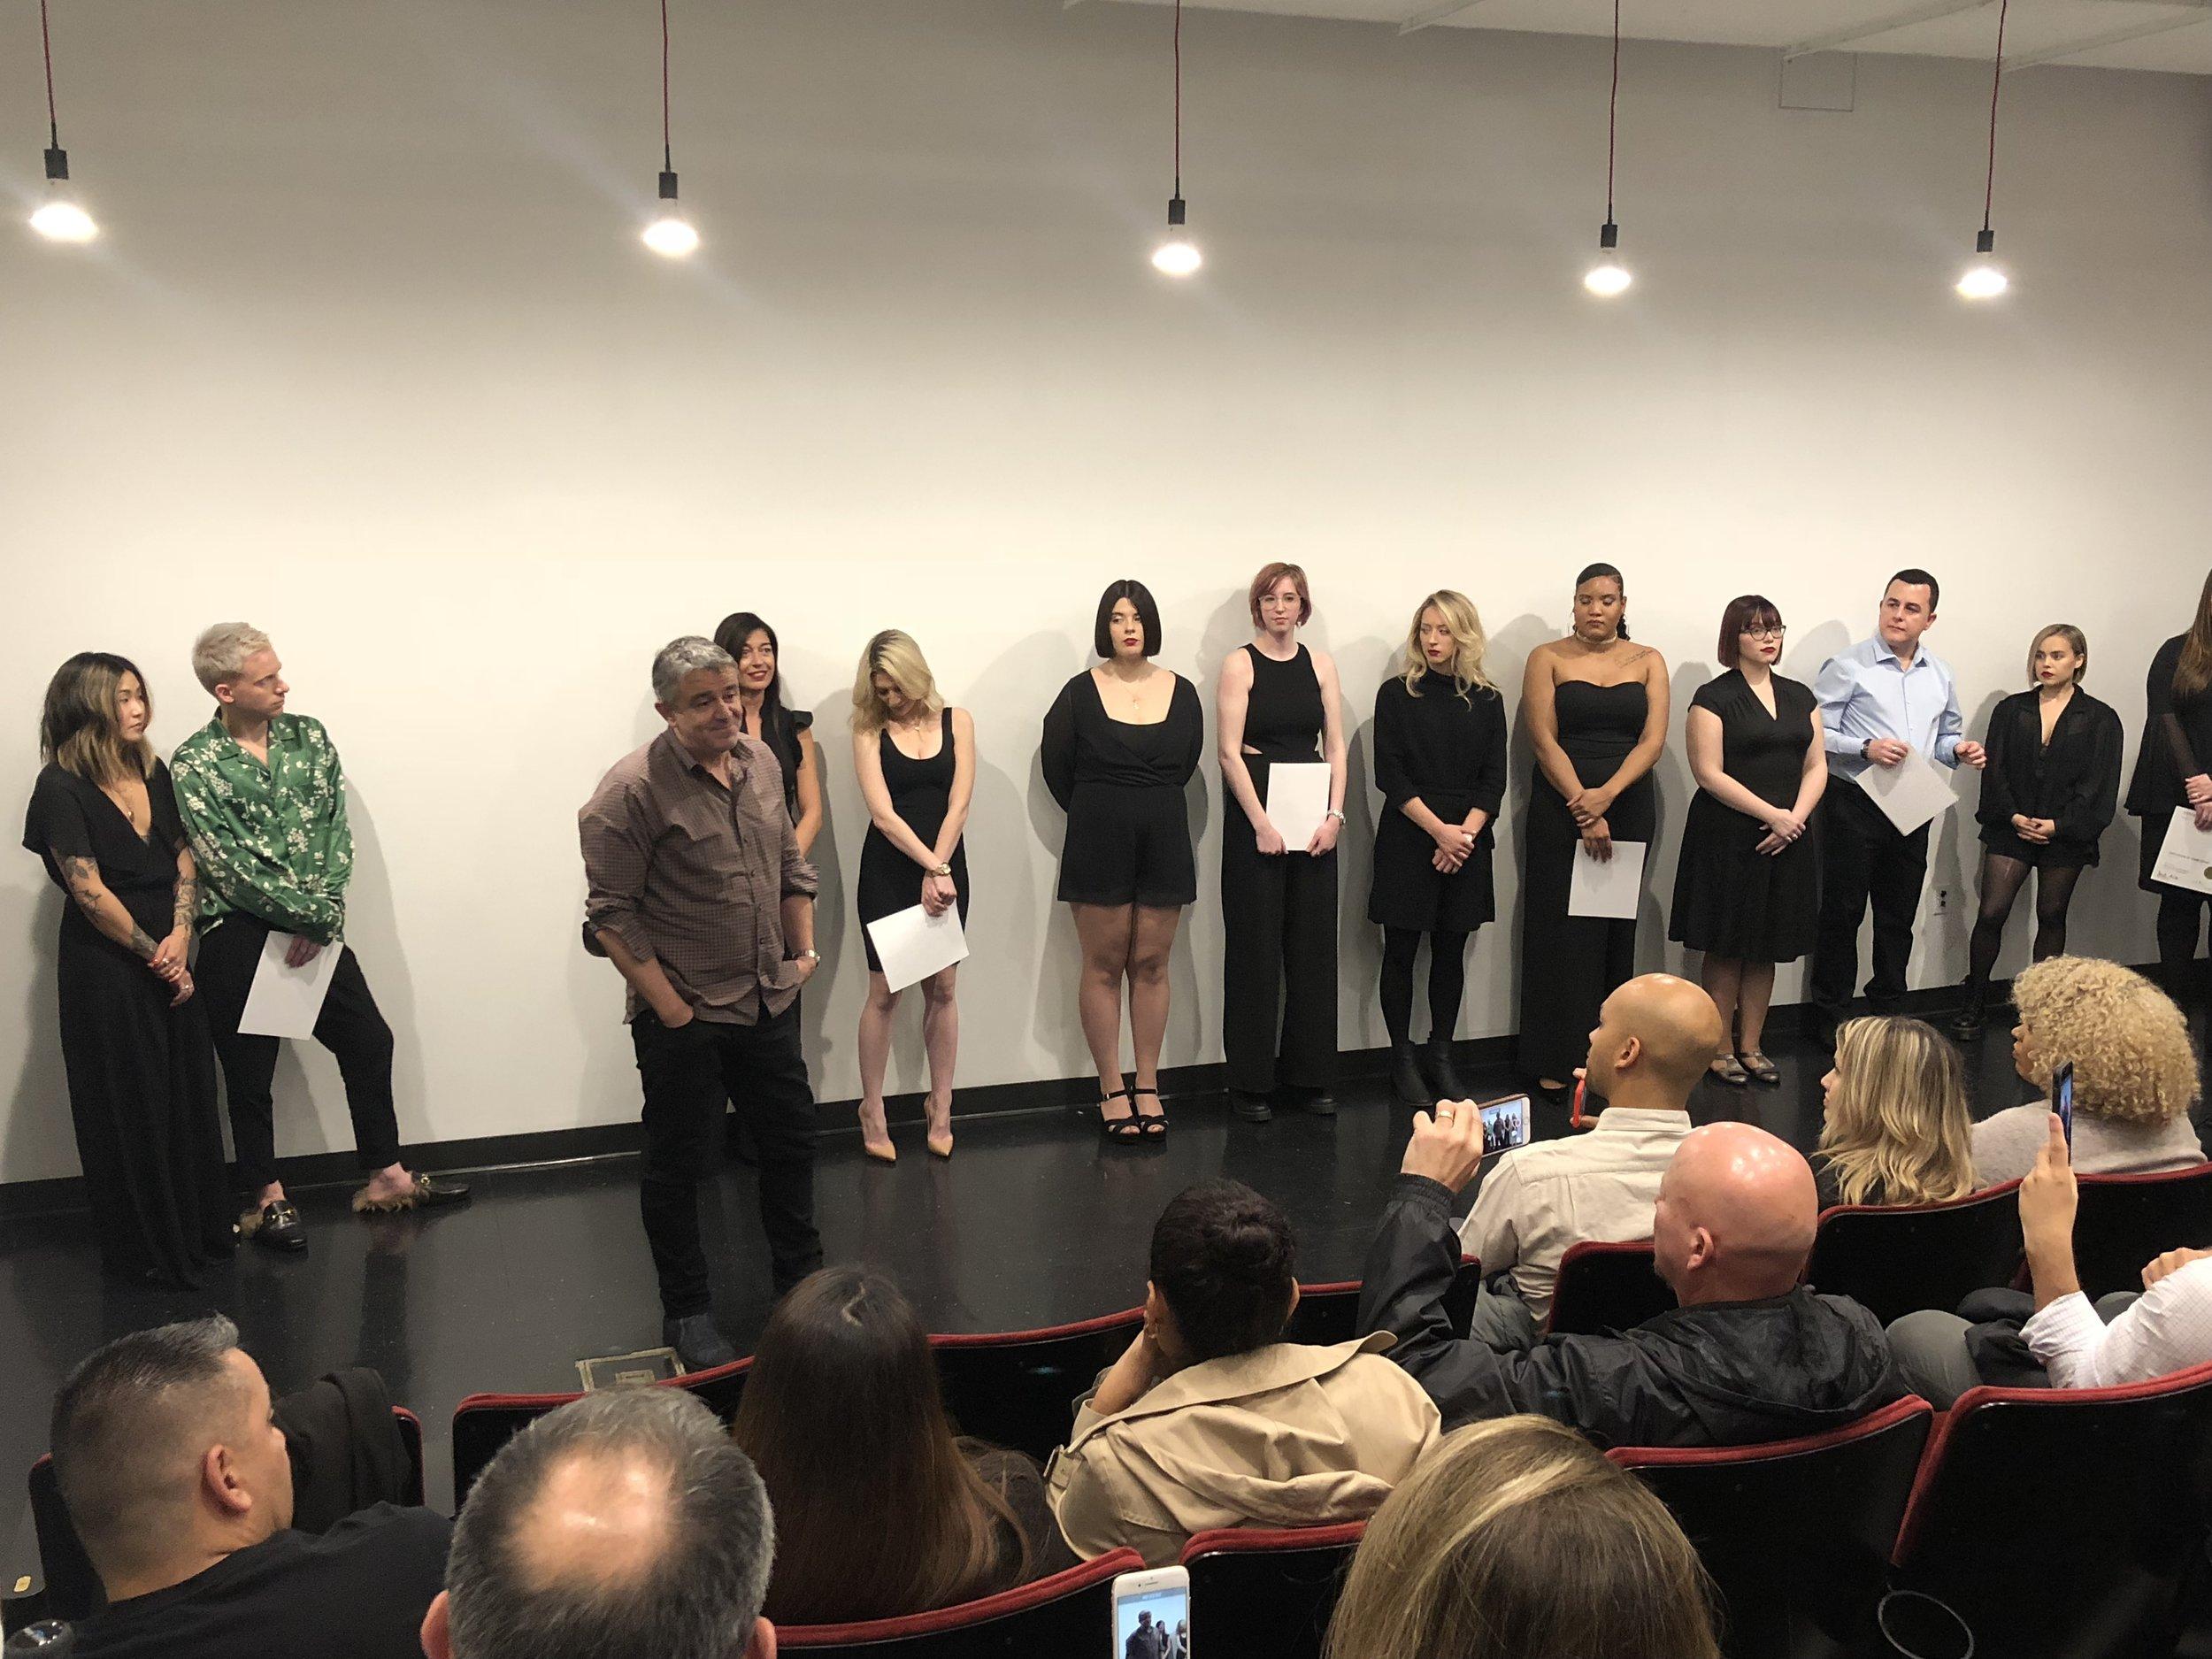 Nick Arrojo congratulates the graduates & gives a send off speech.